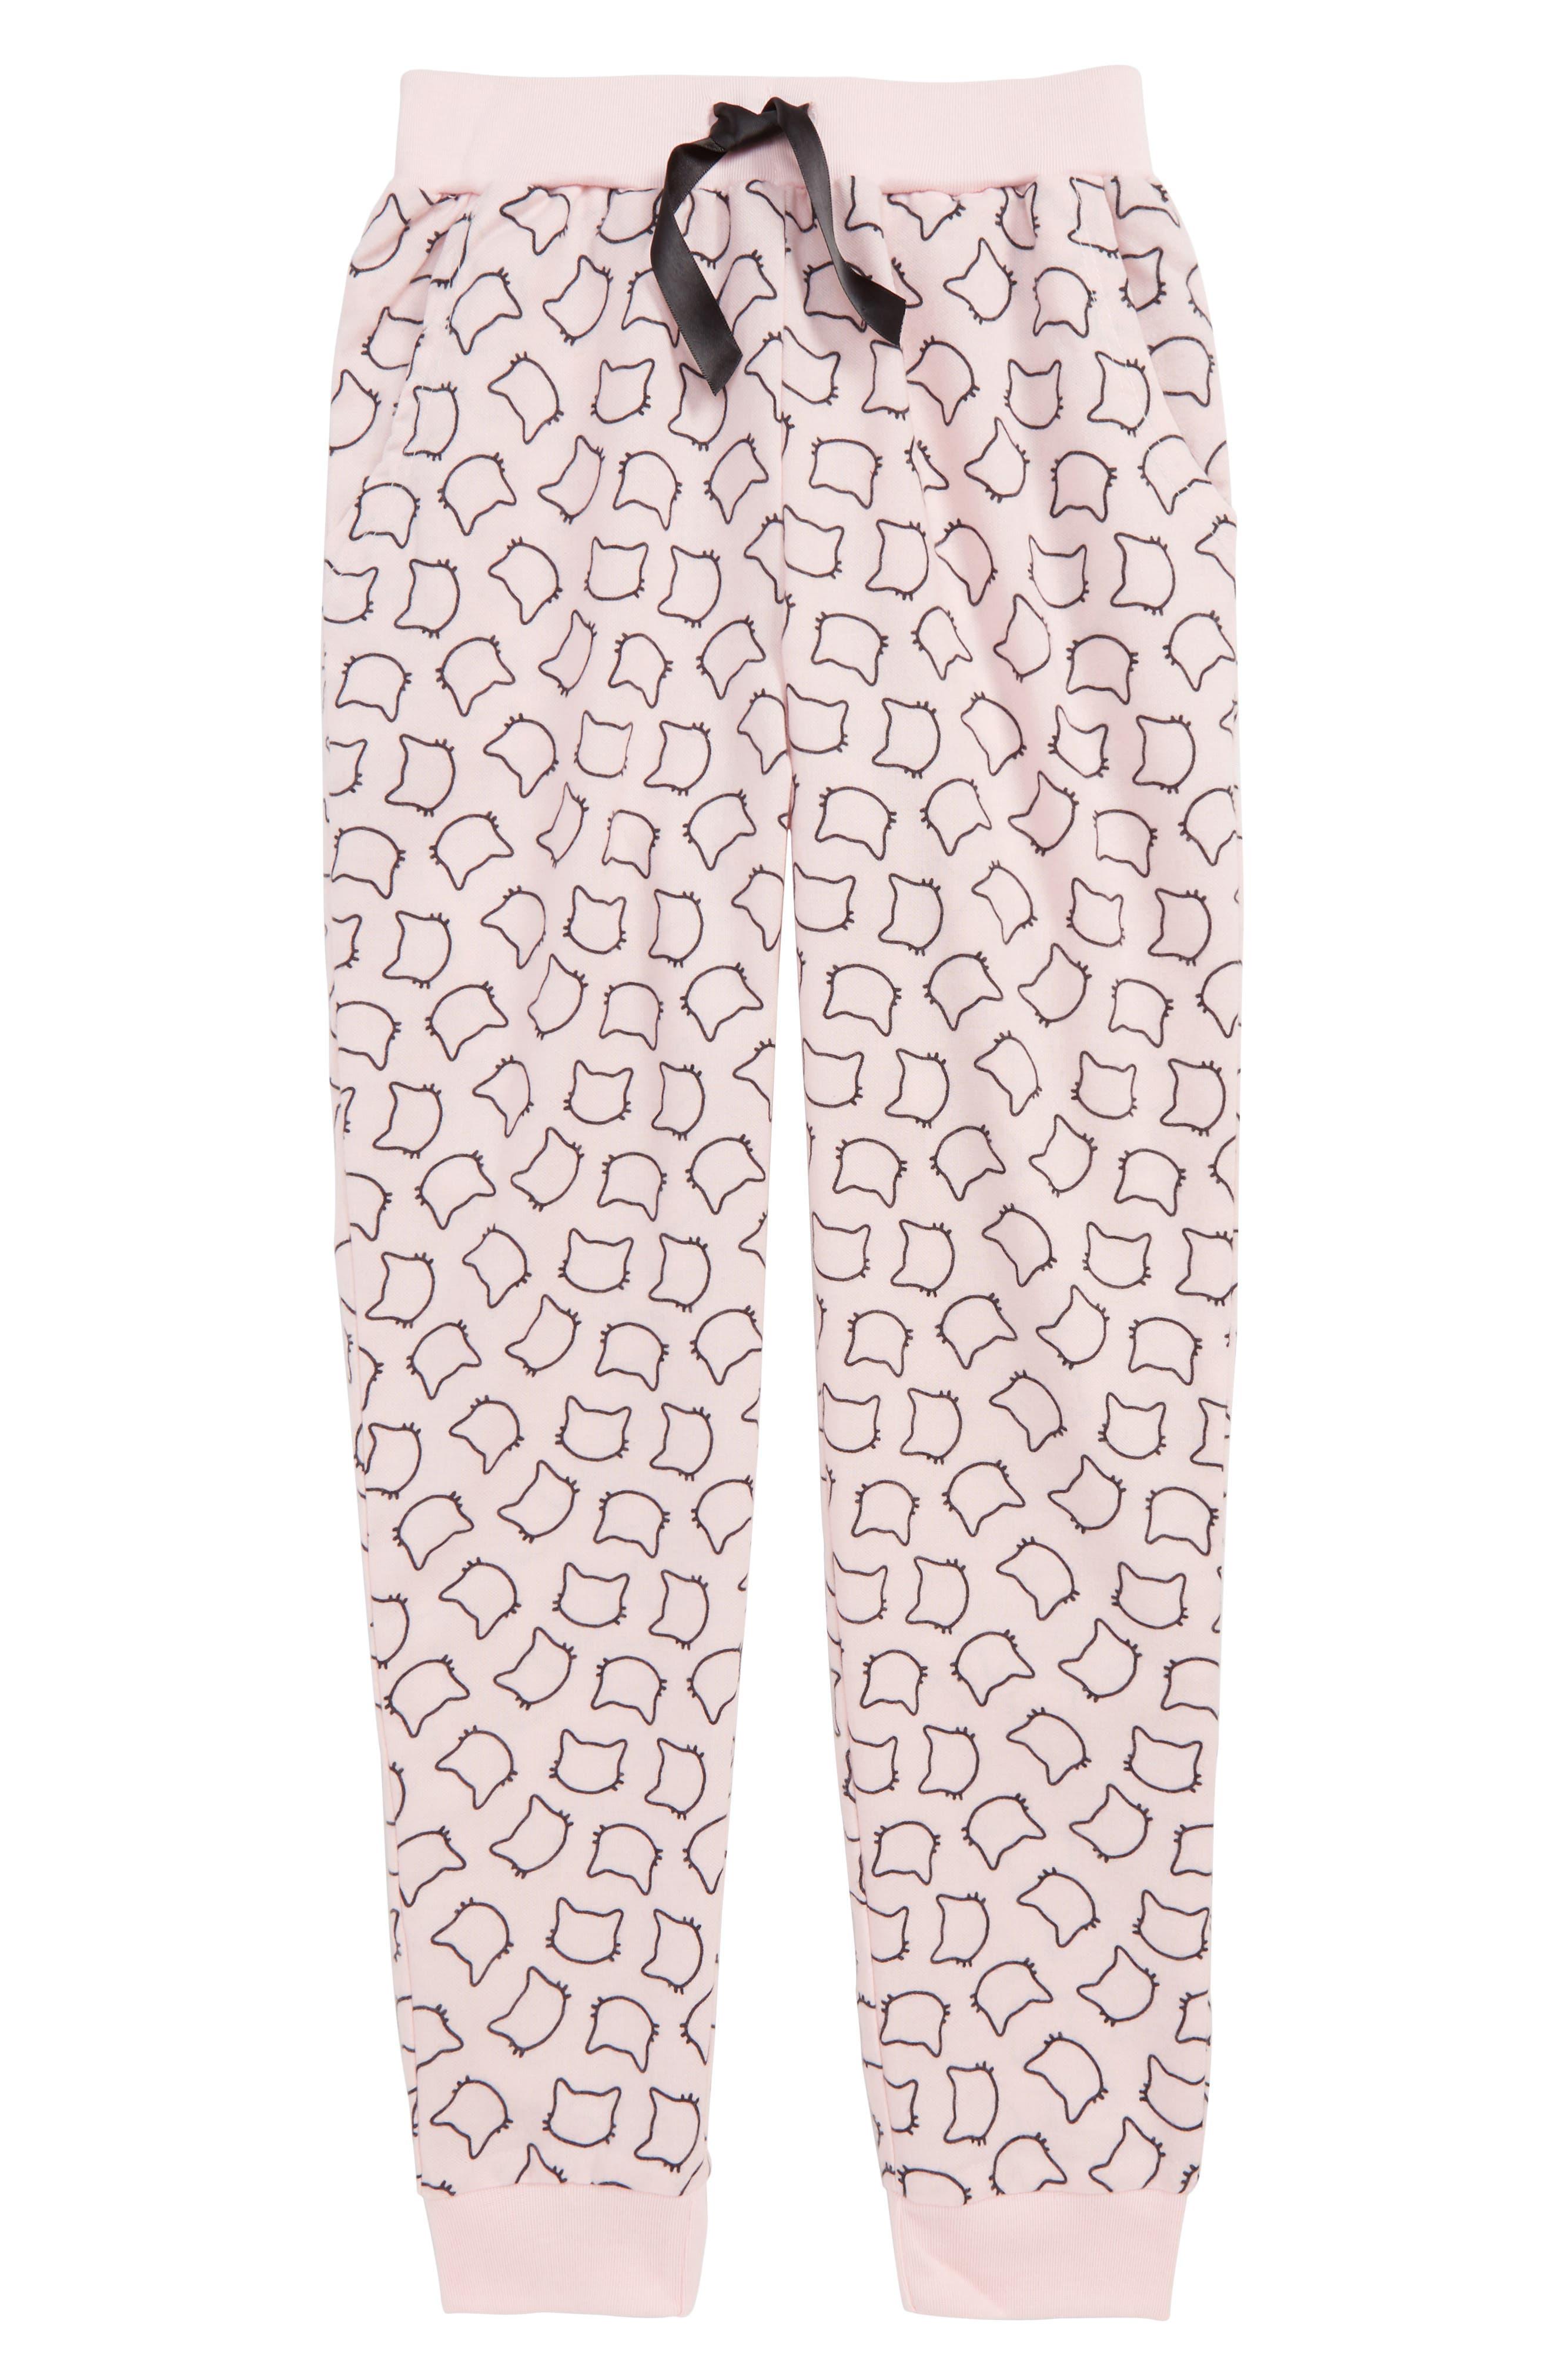 Girls Tucker  Tate Flannel Pajama Pants Size XL (1416)  Pink